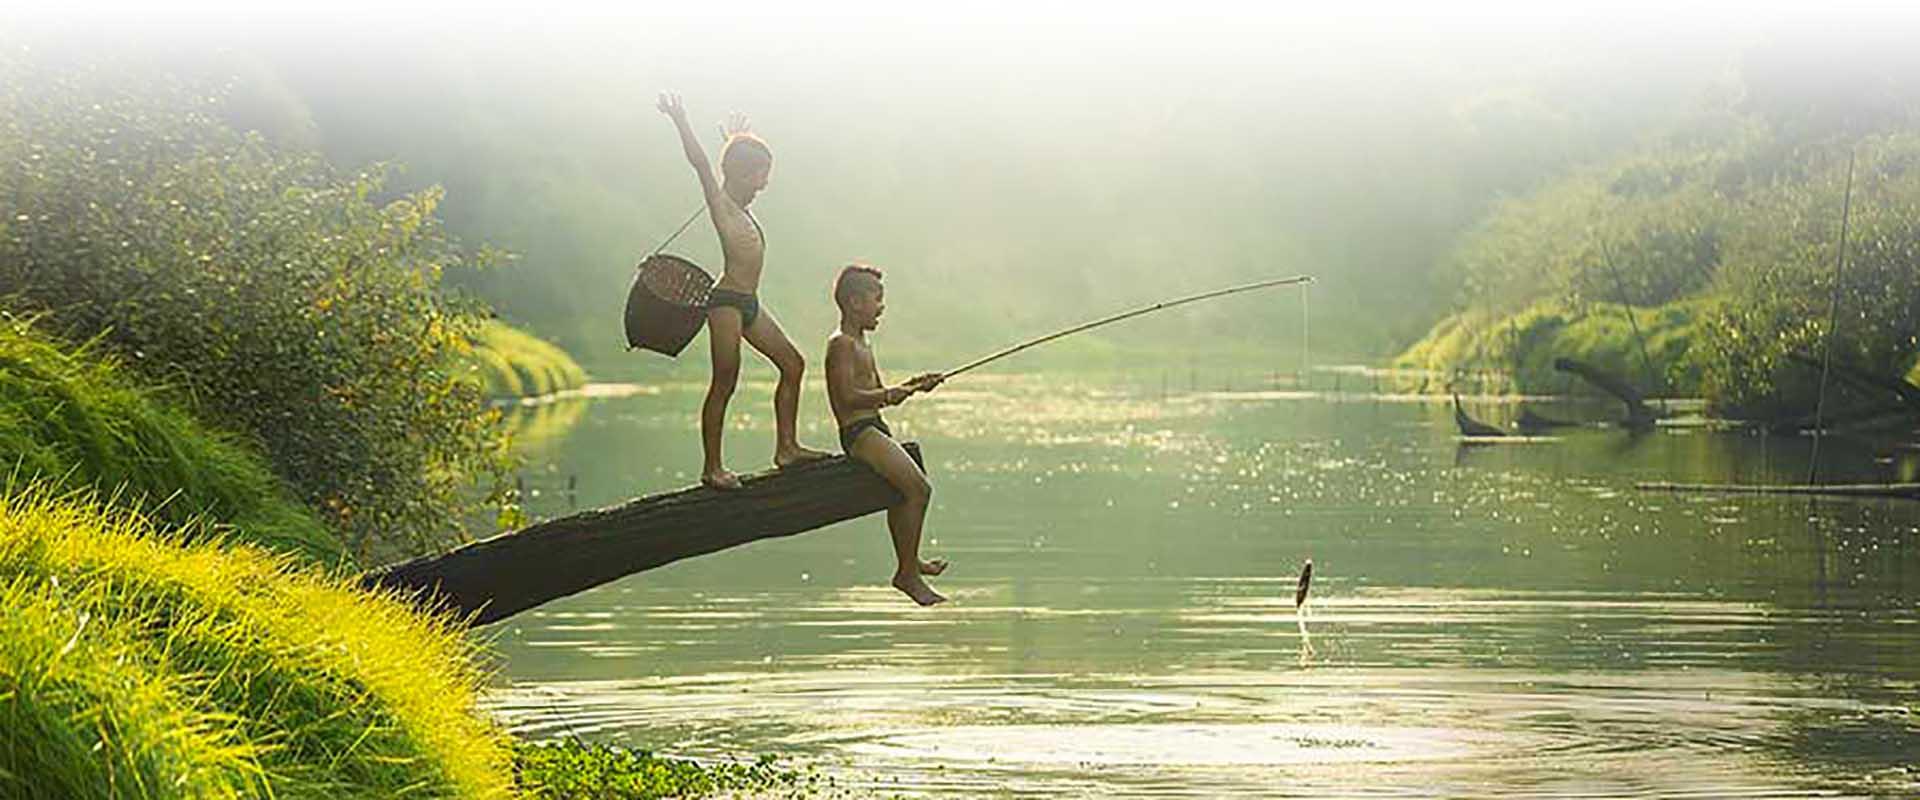 River Kwai tour fishing boys